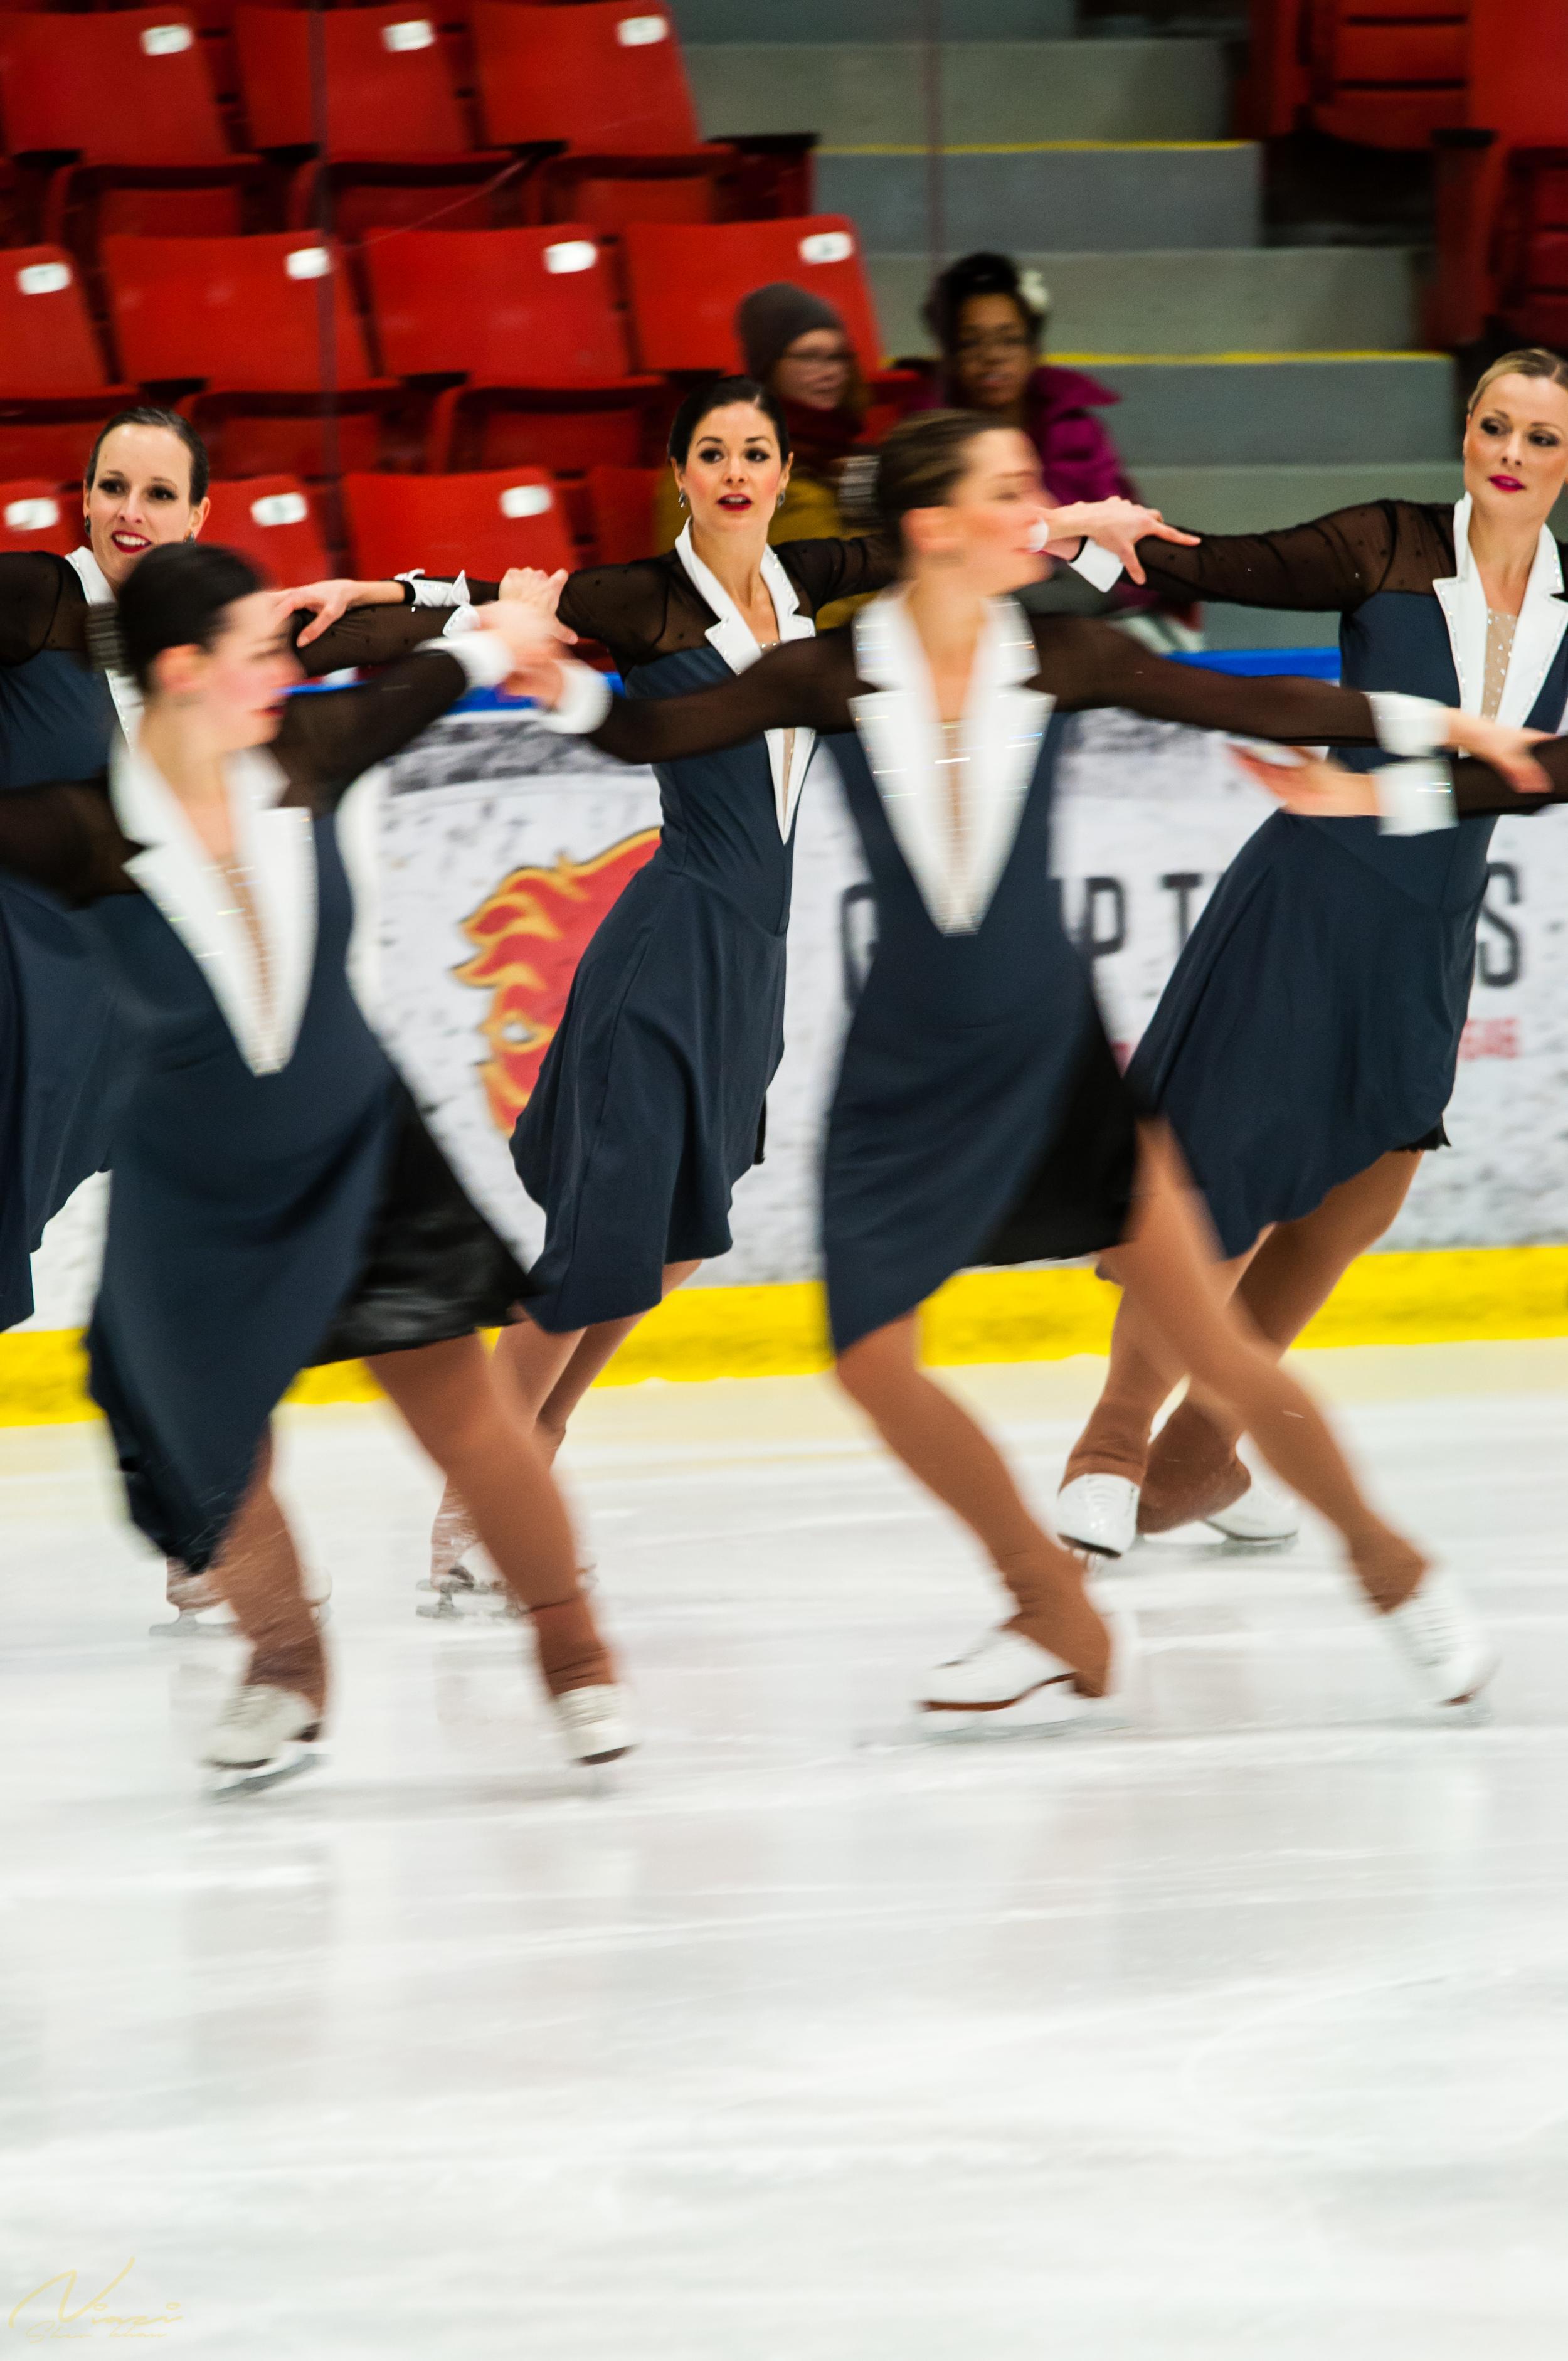 Sher Khan Niazi-Skating-1088.jpg